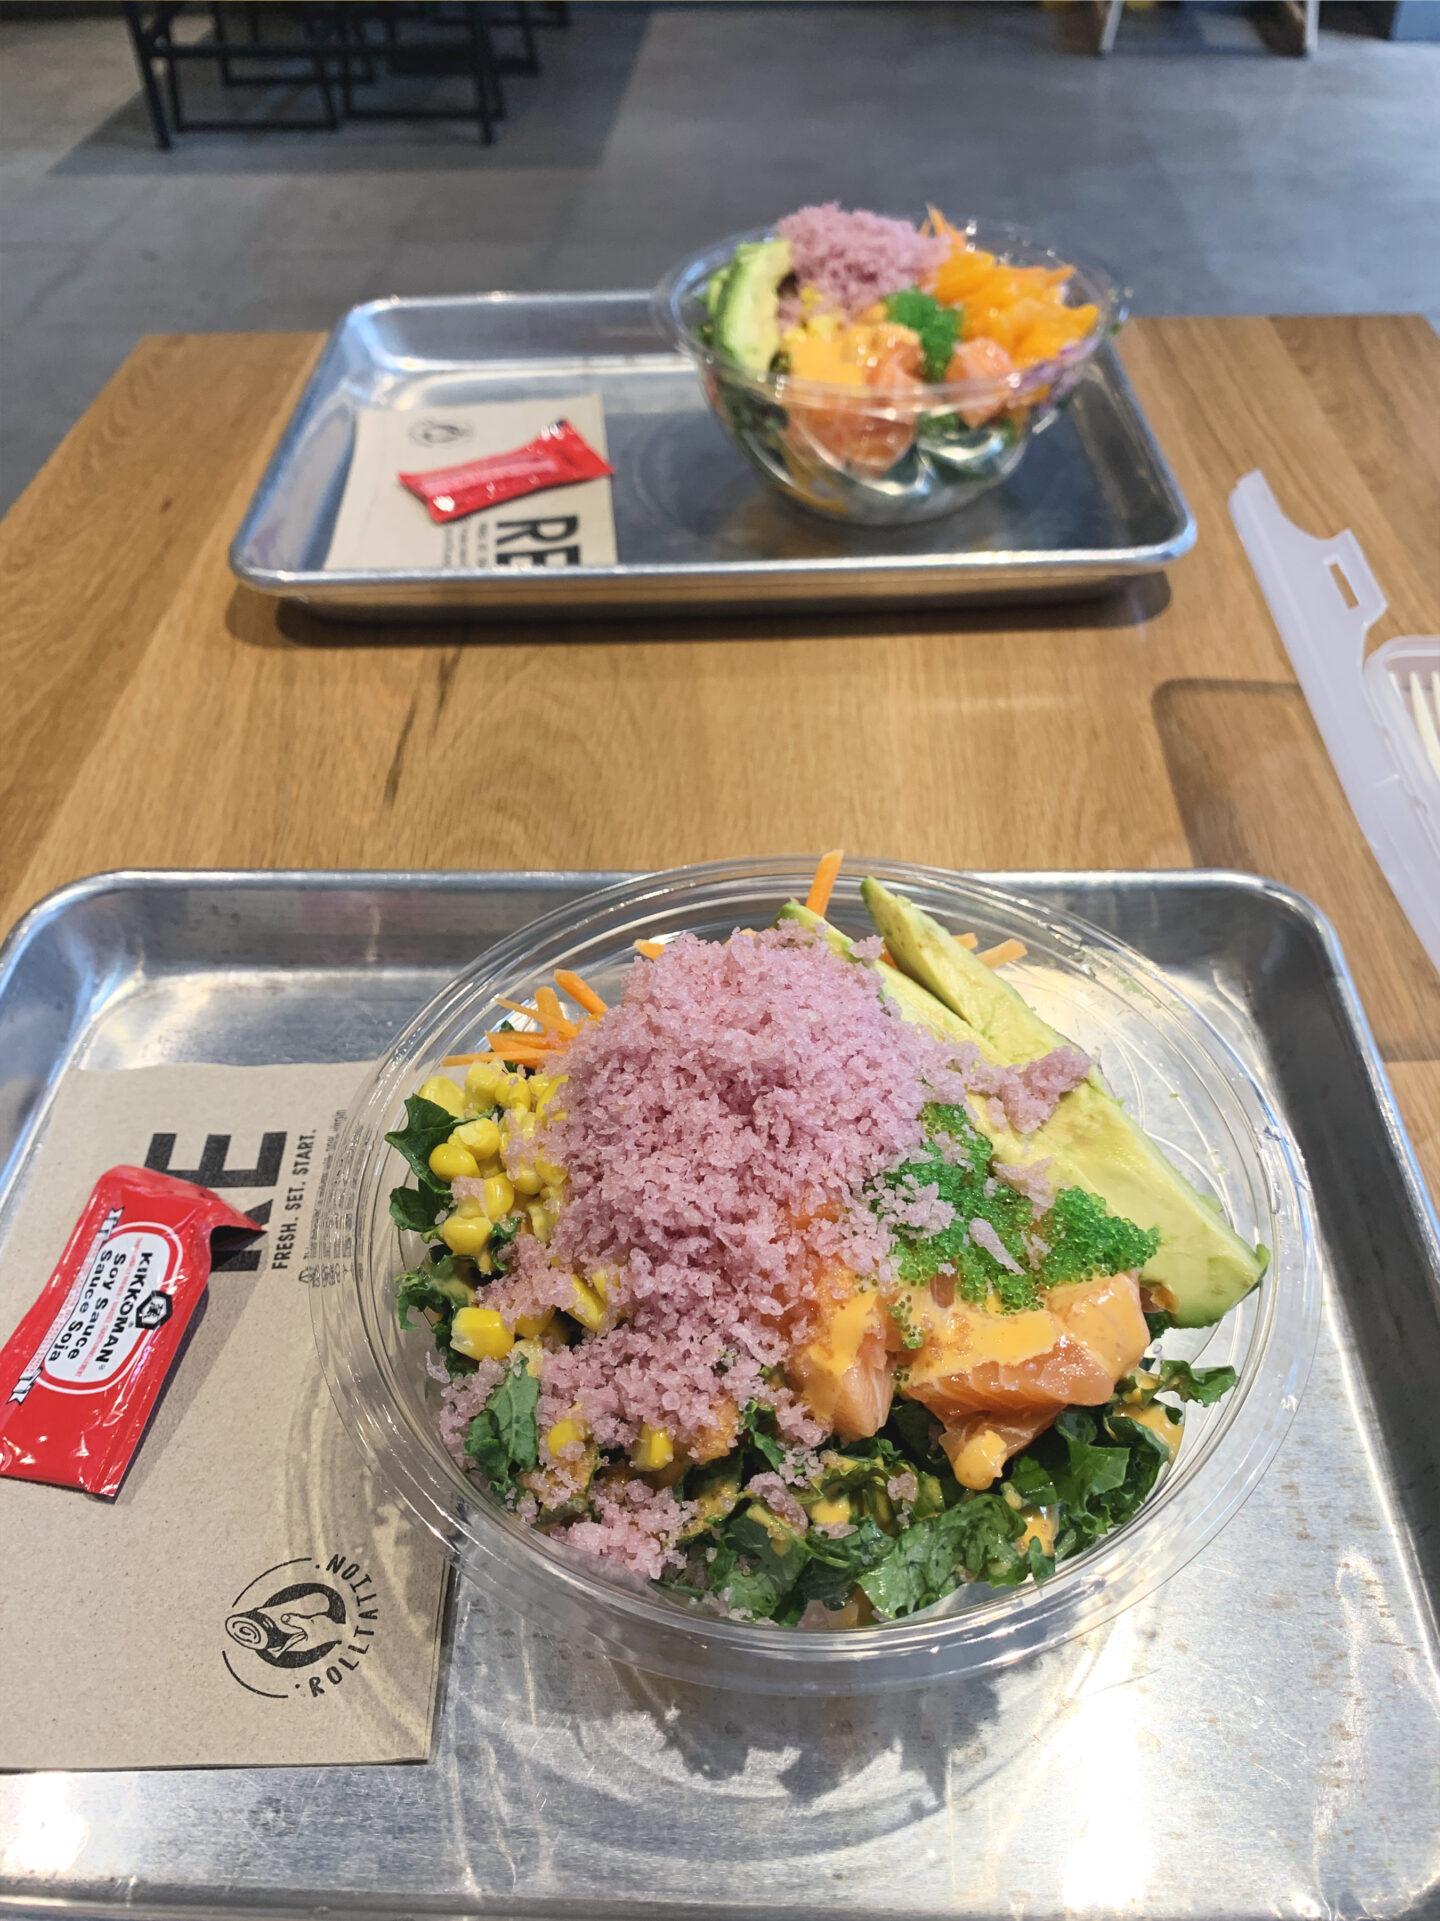 Classic Salmon poké bowl at Rolltation Toronto